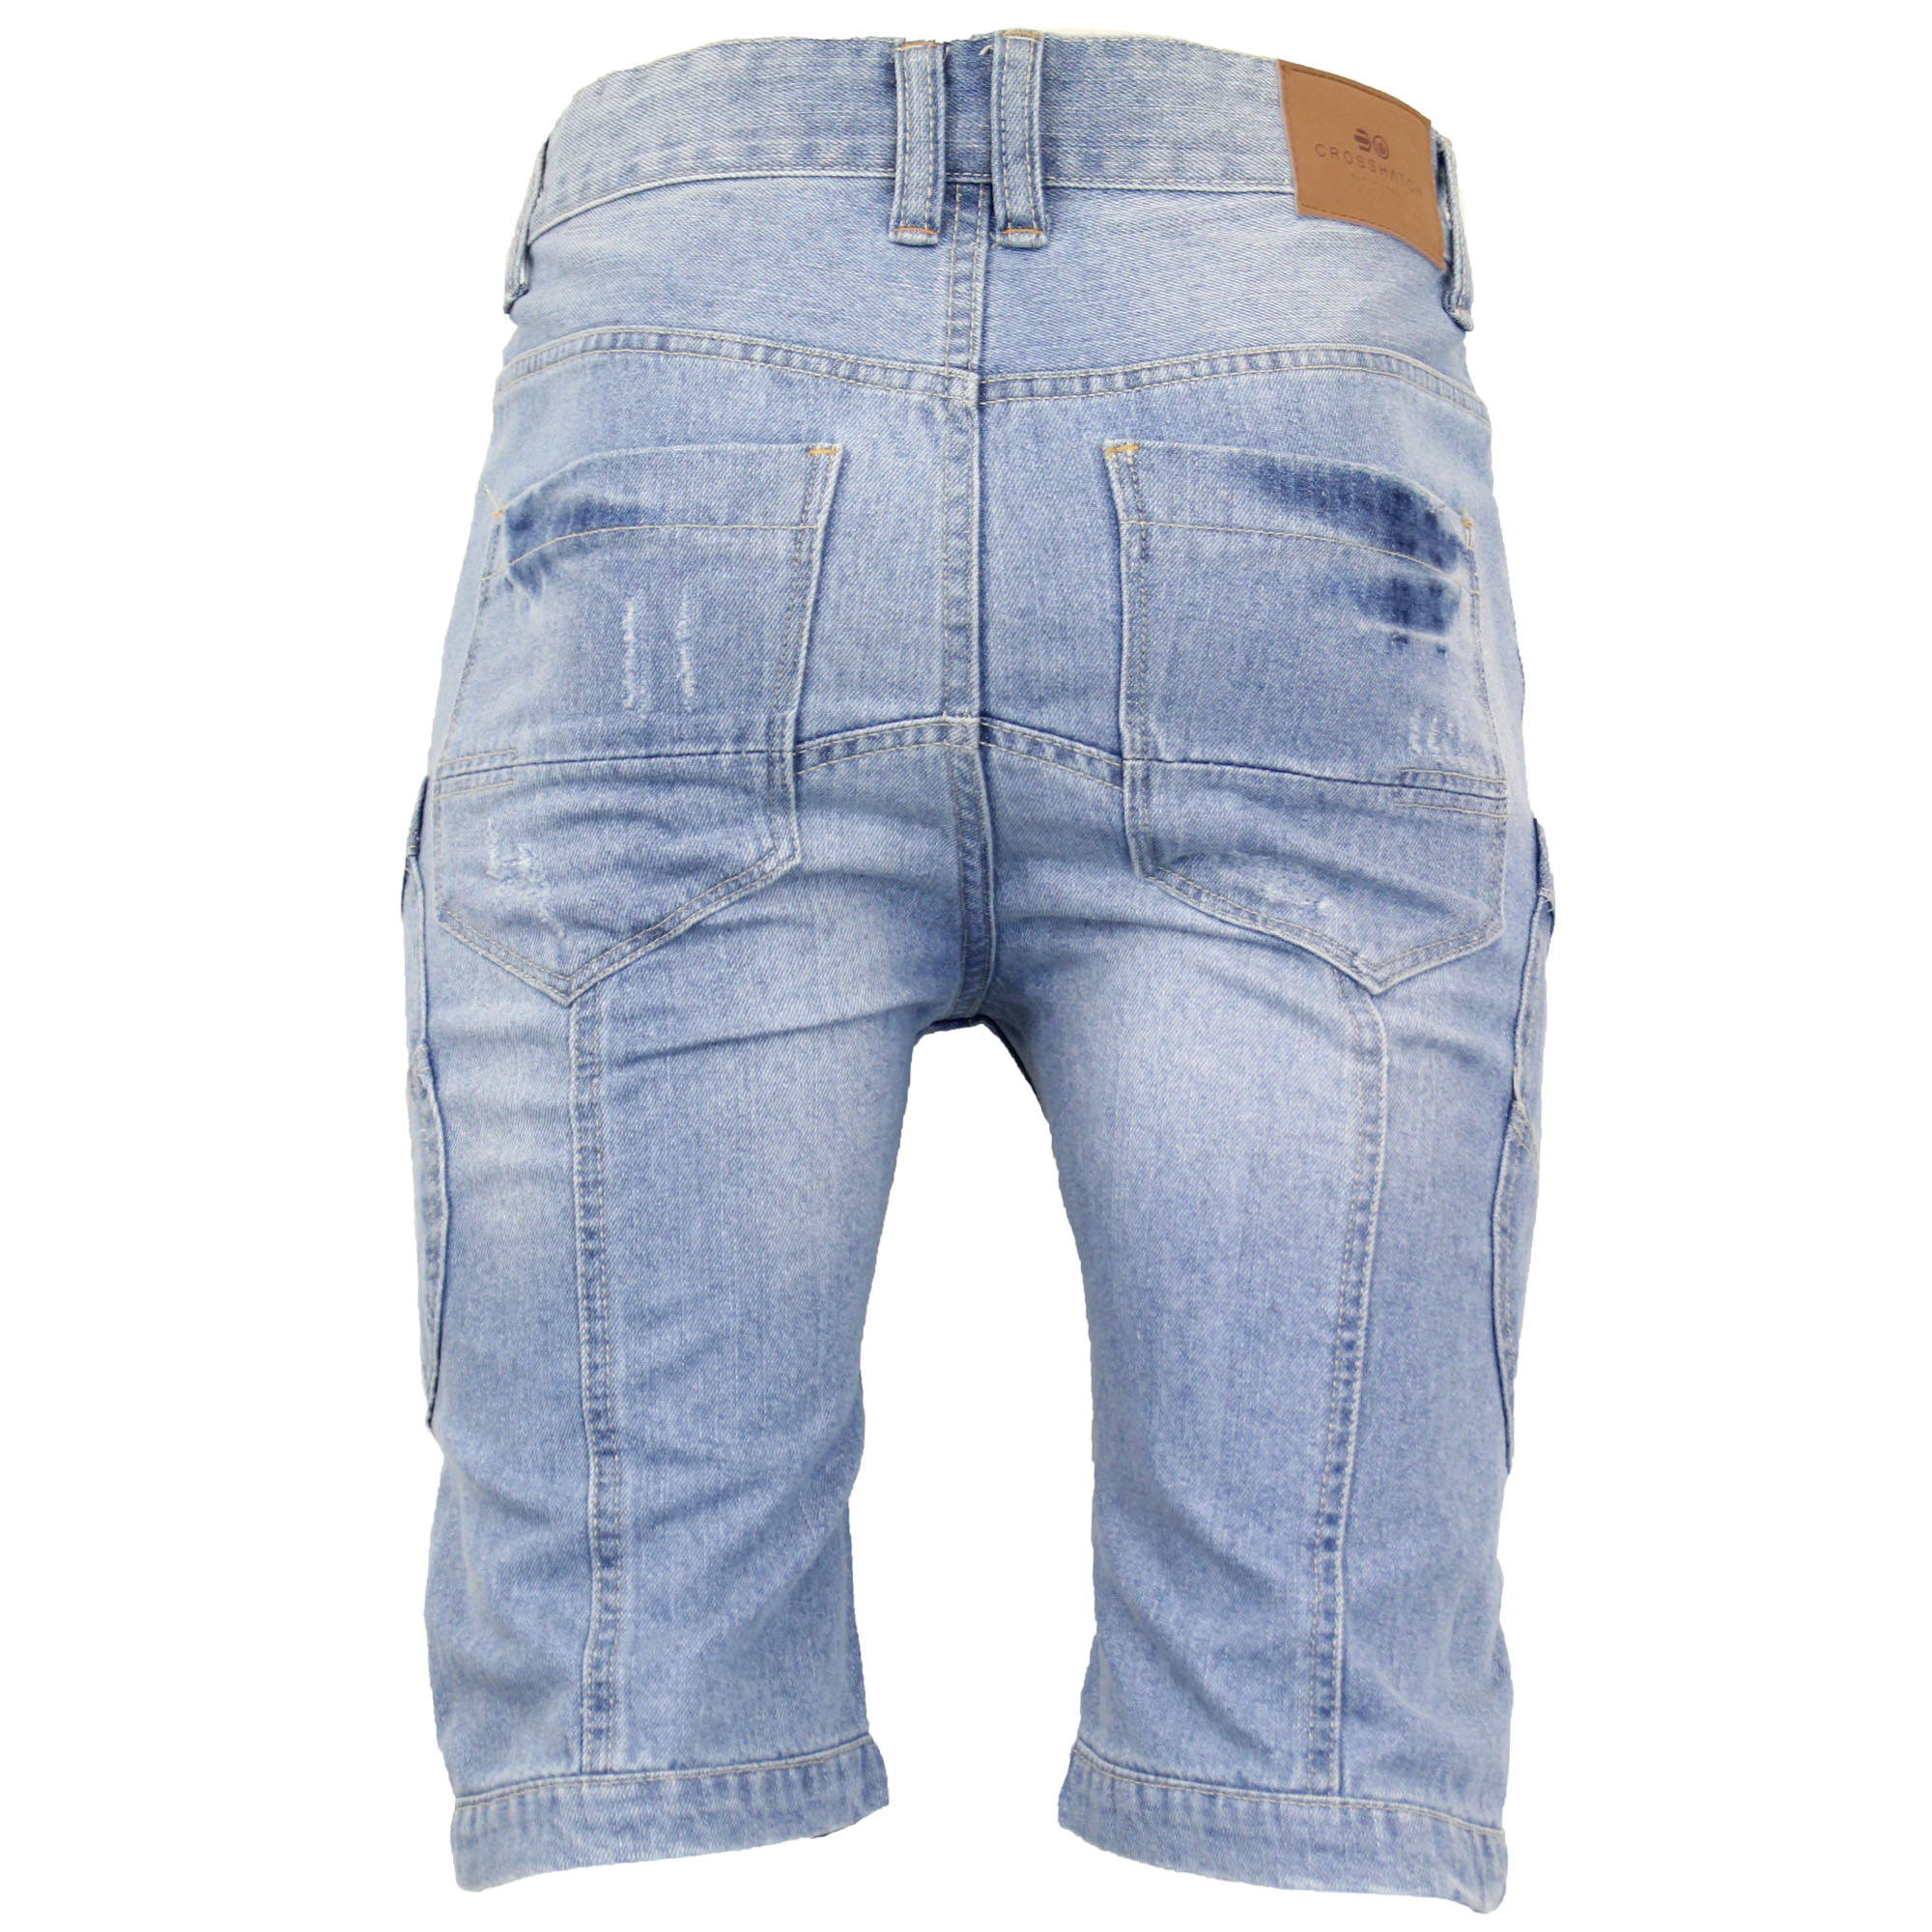 Mens-Crosshatch-Denim-Knee-Length-Combat-Shorts-Cargo-Casual-Fashion-Summer-New 縮圖 35